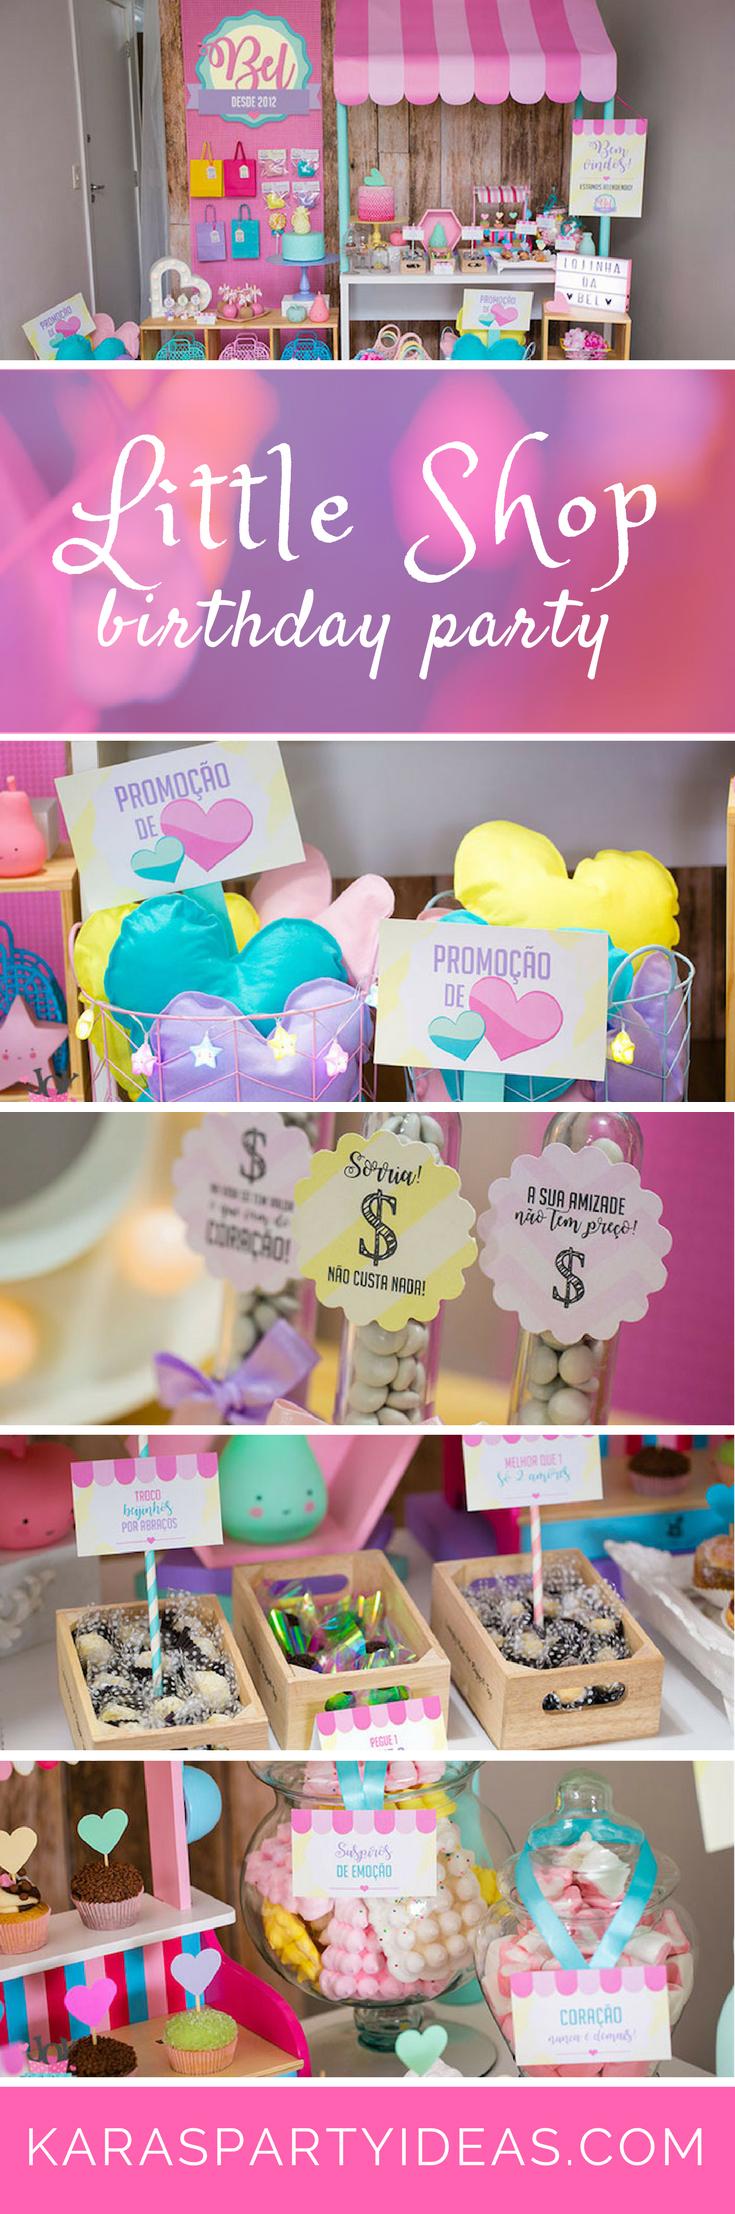 Little Shop Birthday Party - Karas Party Ideas via KarasPartyIdeas.com